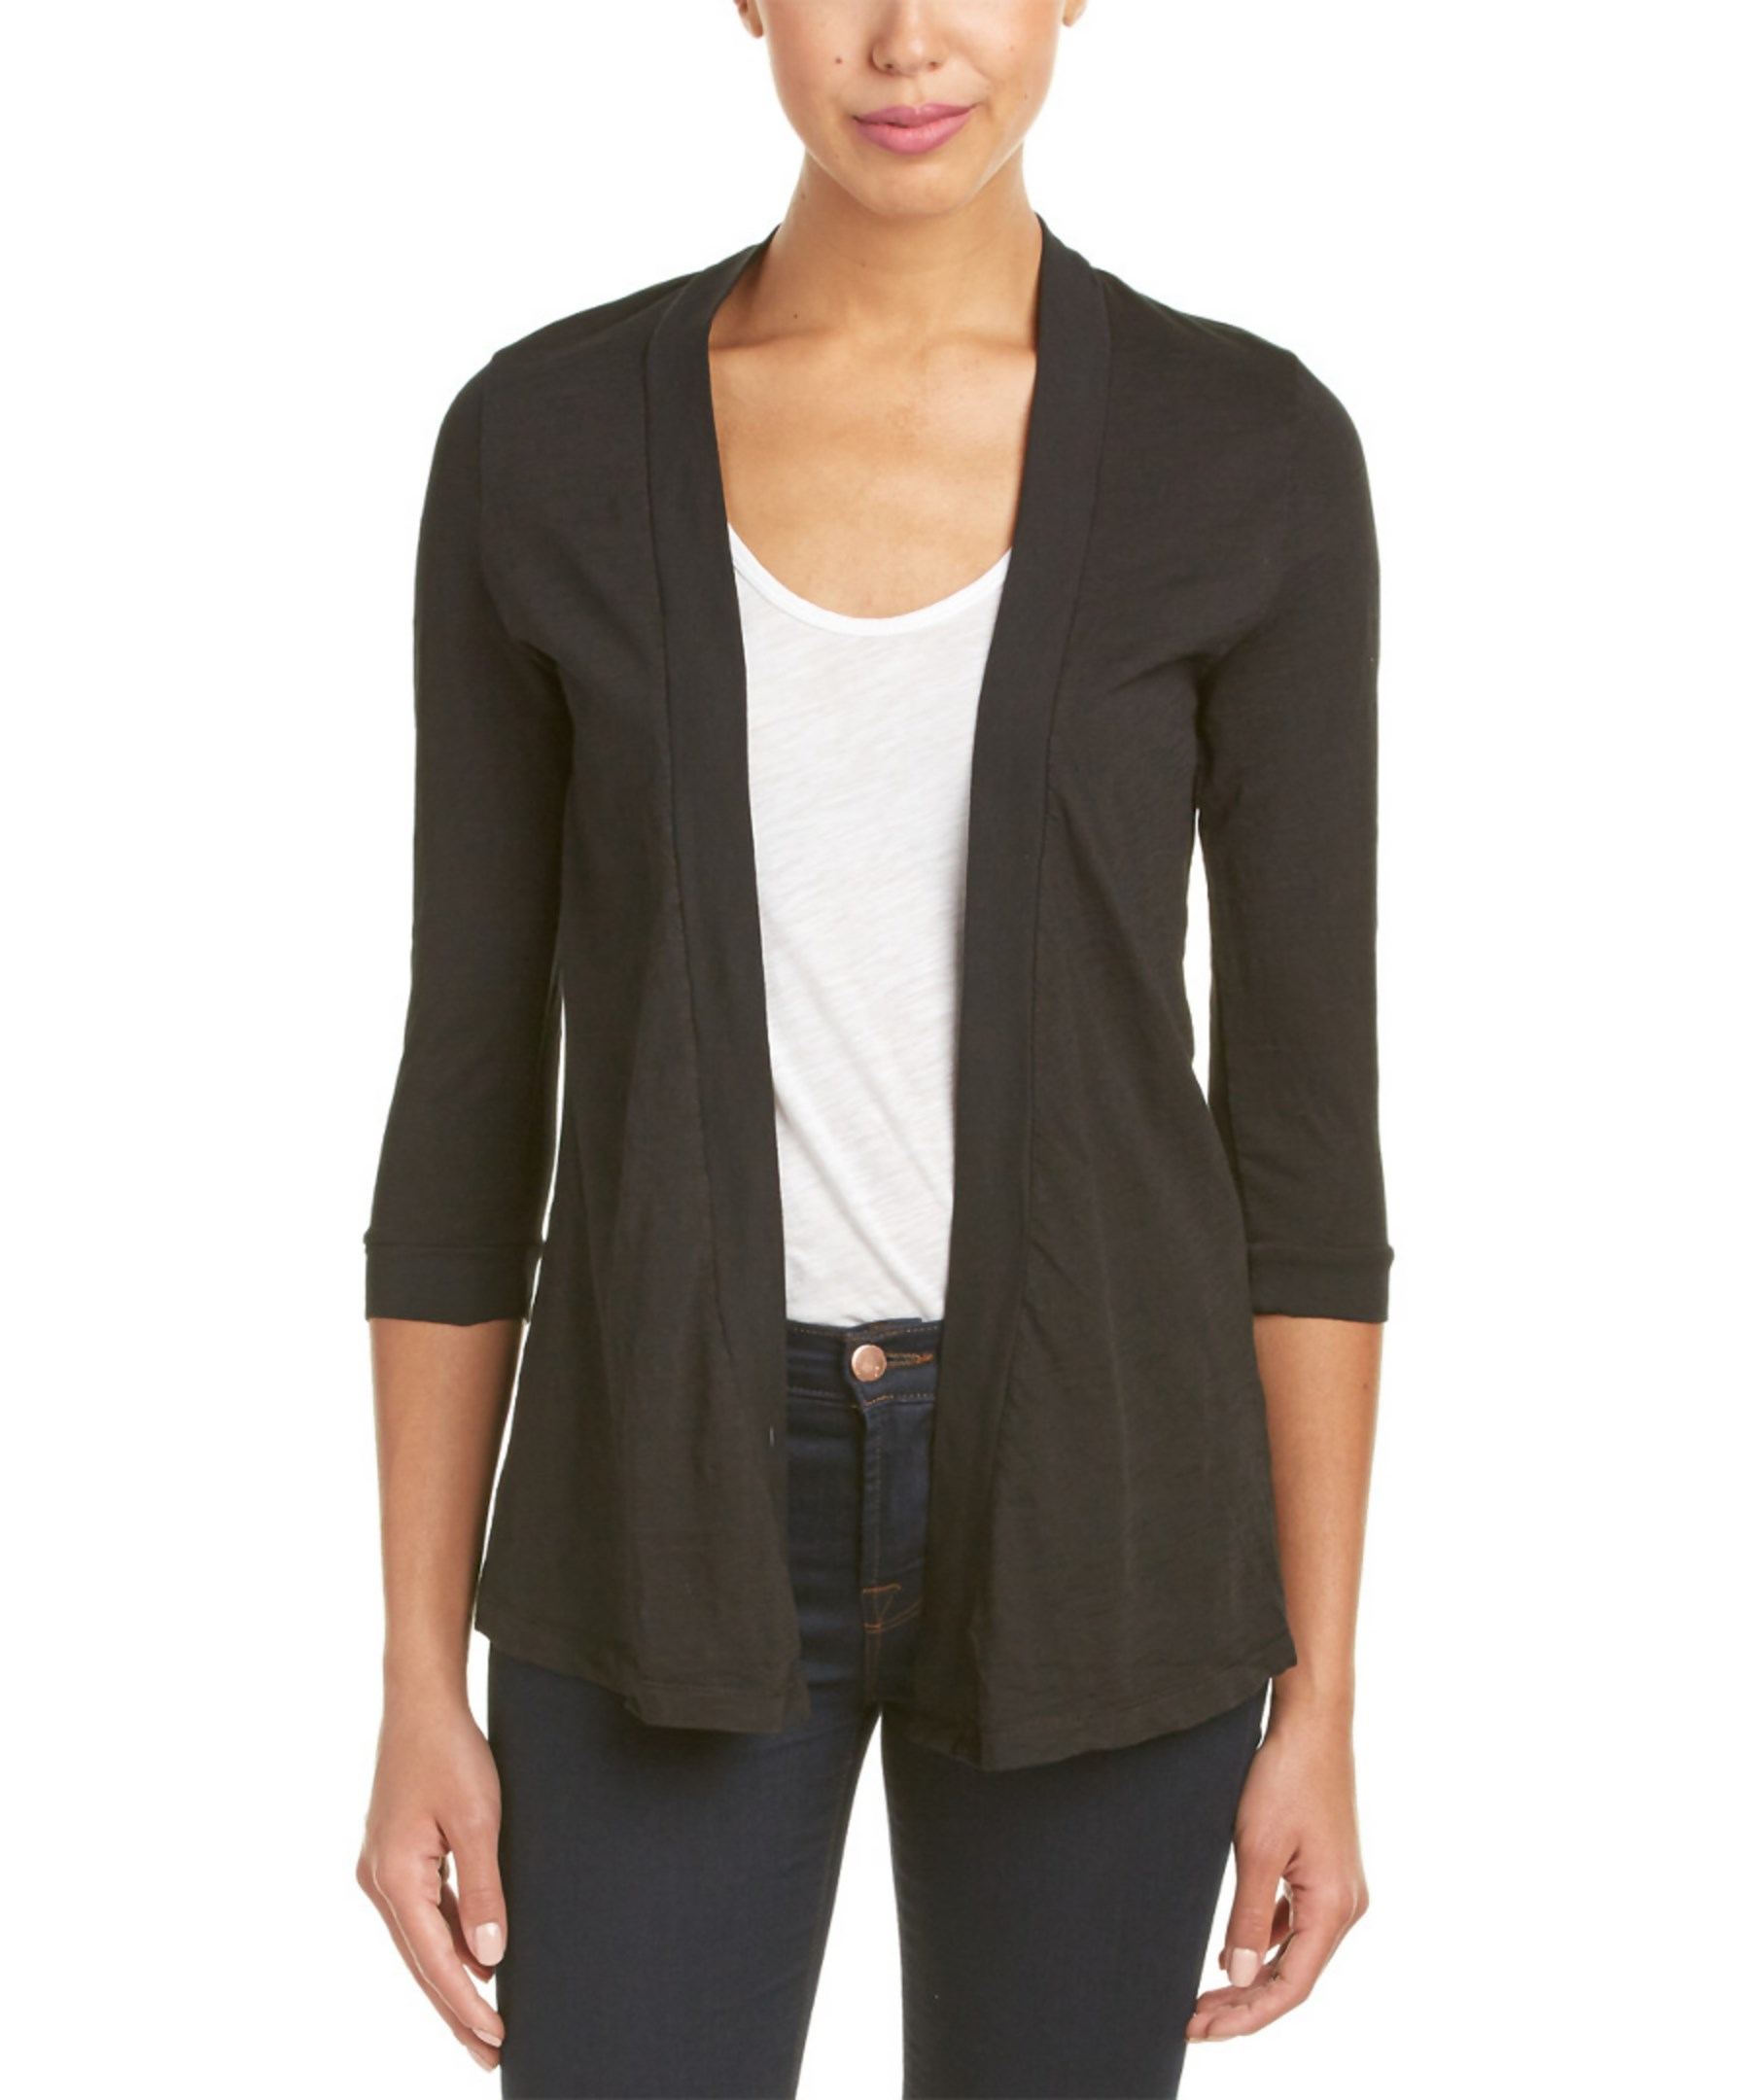 zip neck 3 4 sleeve sweater dress and Calvin Klein Black items found.